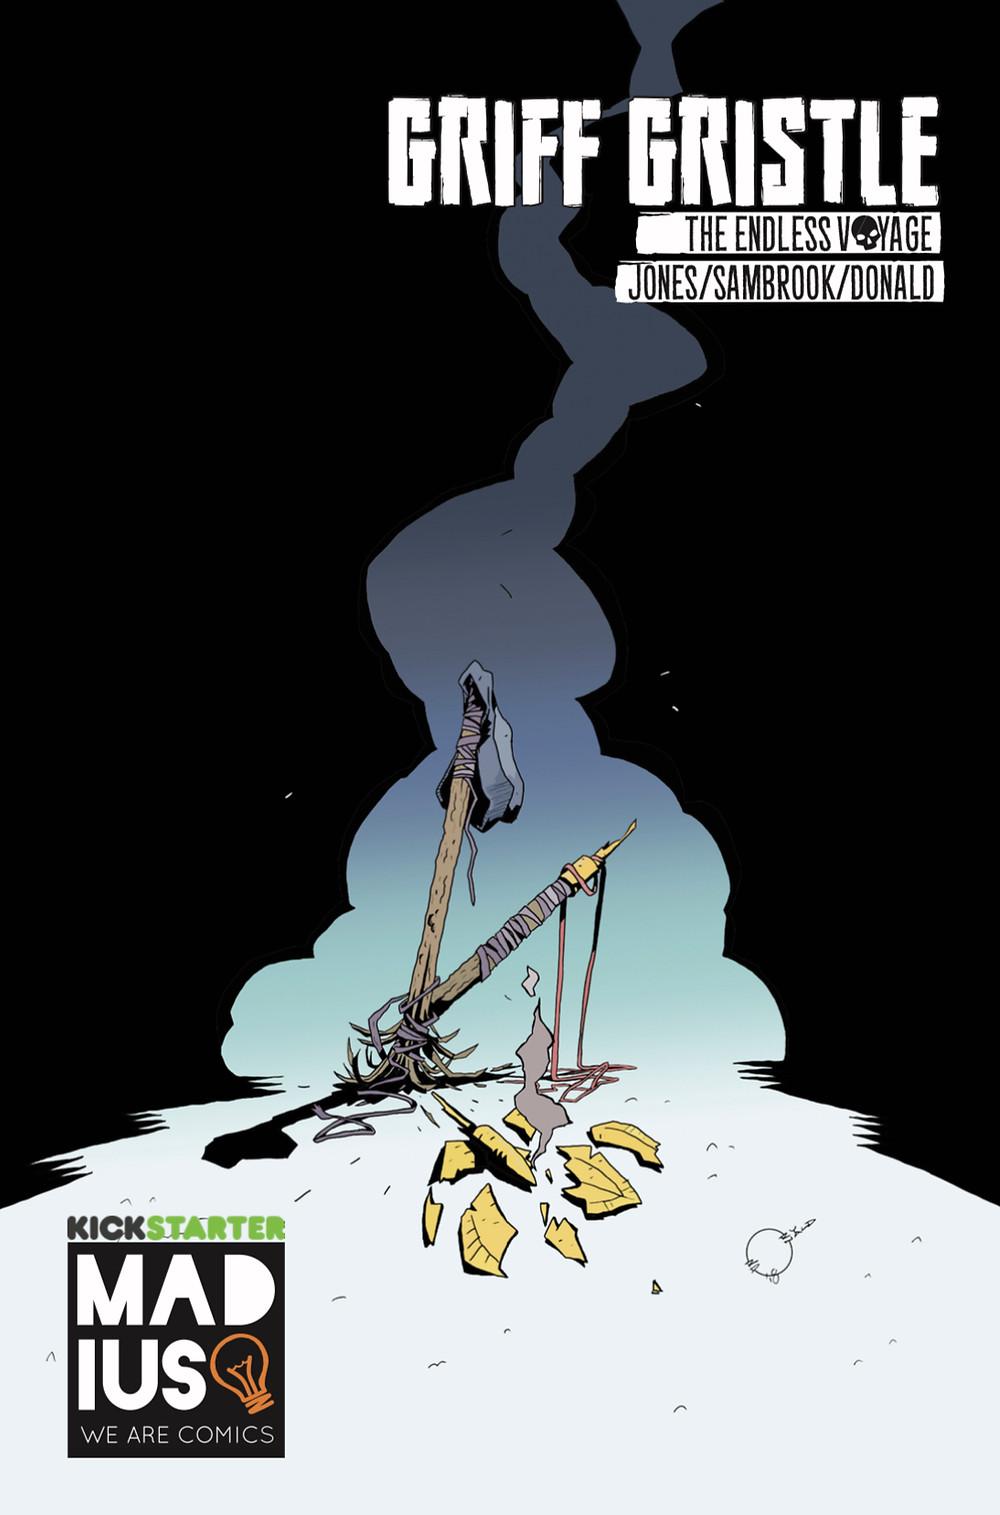 Griff Gristle #3, cover, Madius Comics, Jones/Sambrook/Donald